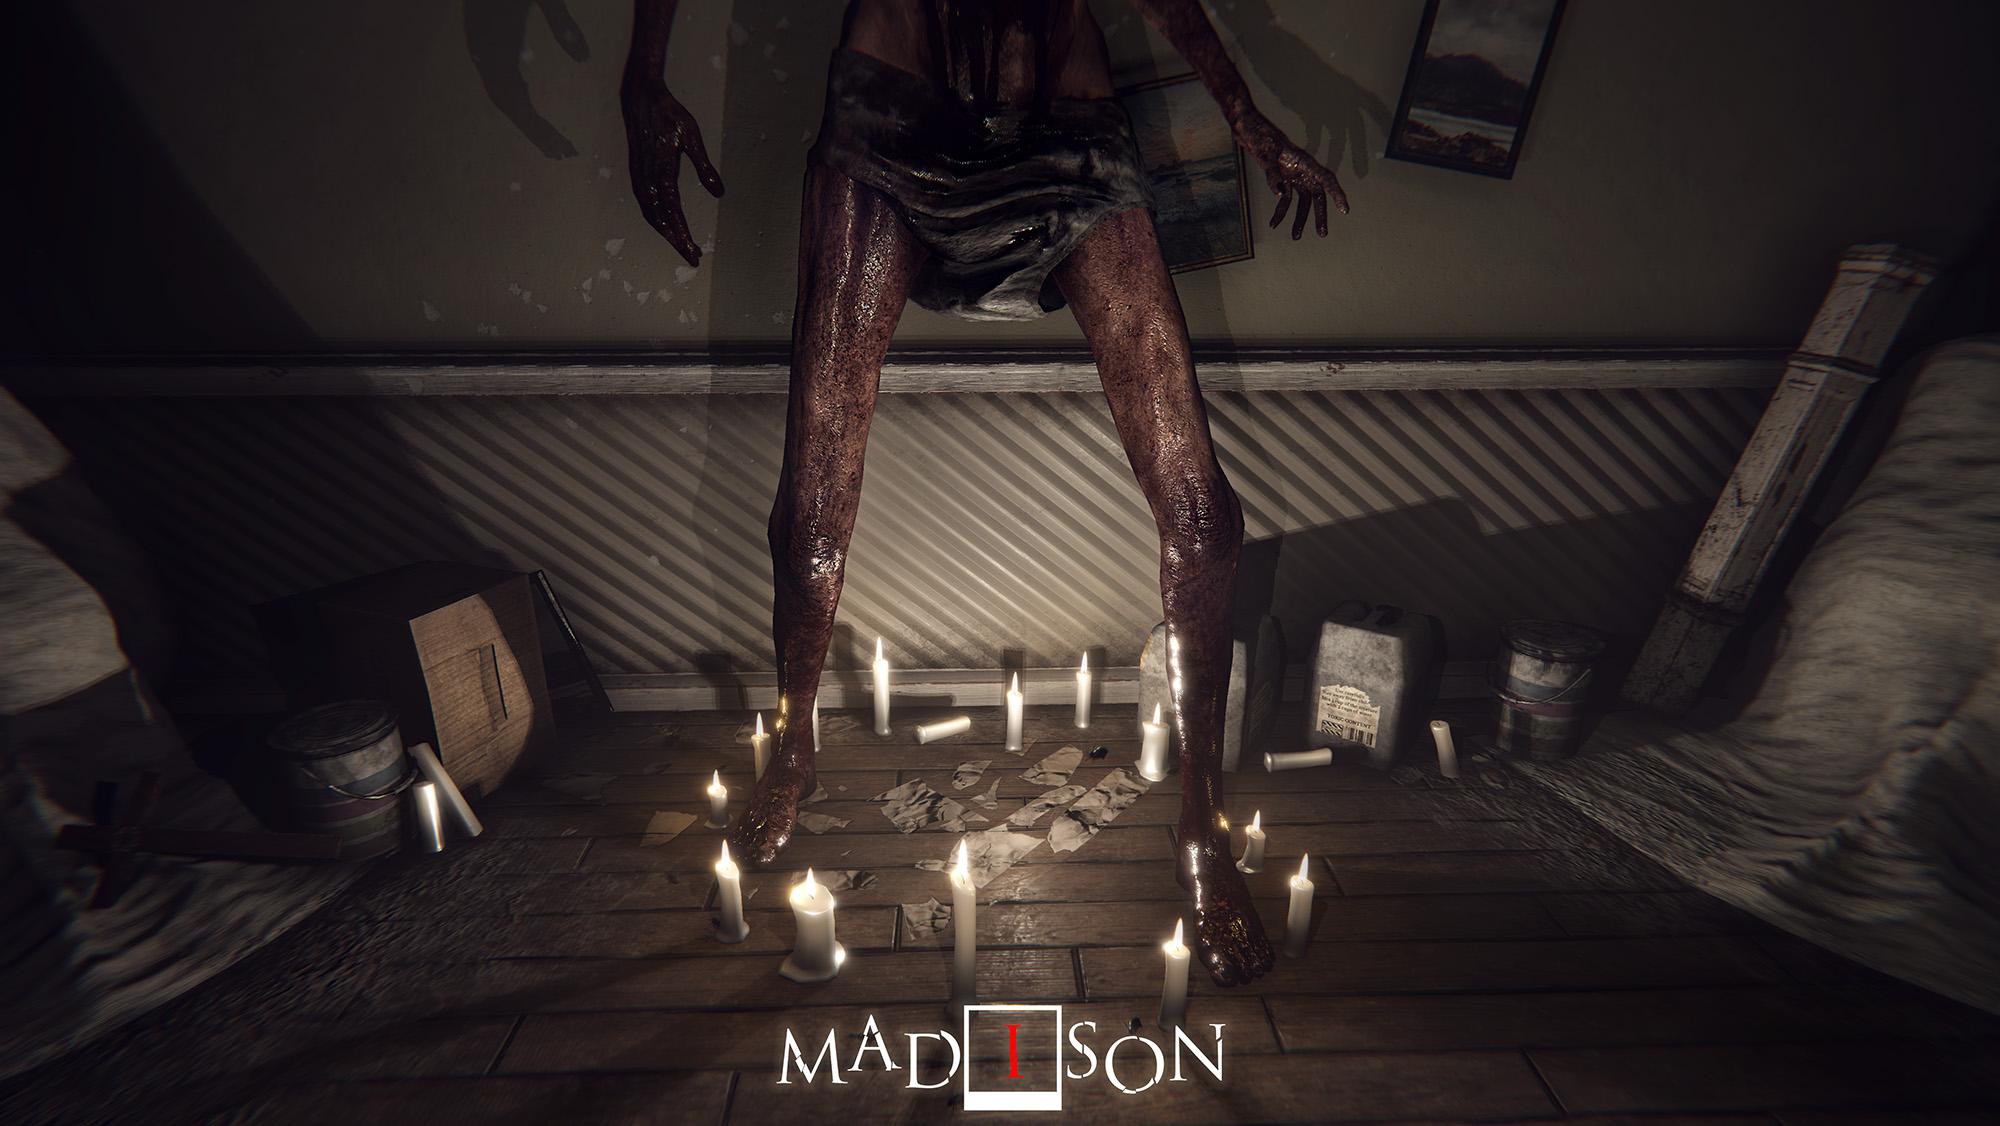 MADiSON PSYCHOLOGICAL HORROR GAME